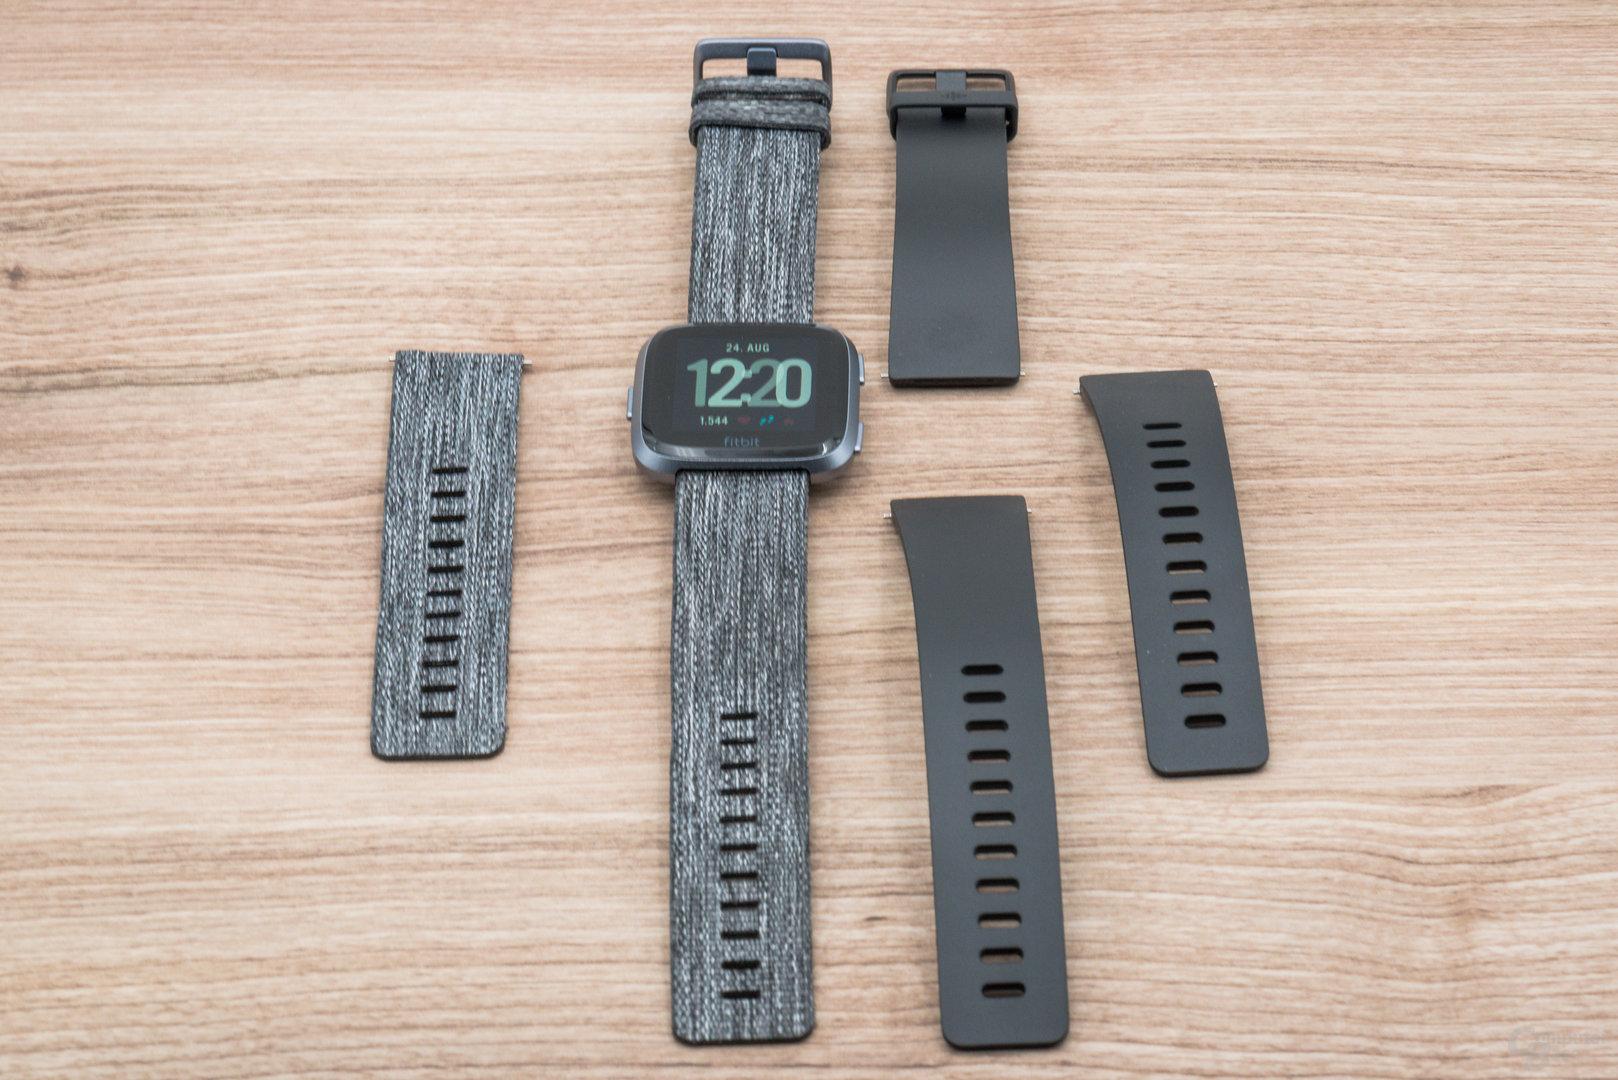 Fitbit Versa im Test: Zwei Armbandtypen inkludiert